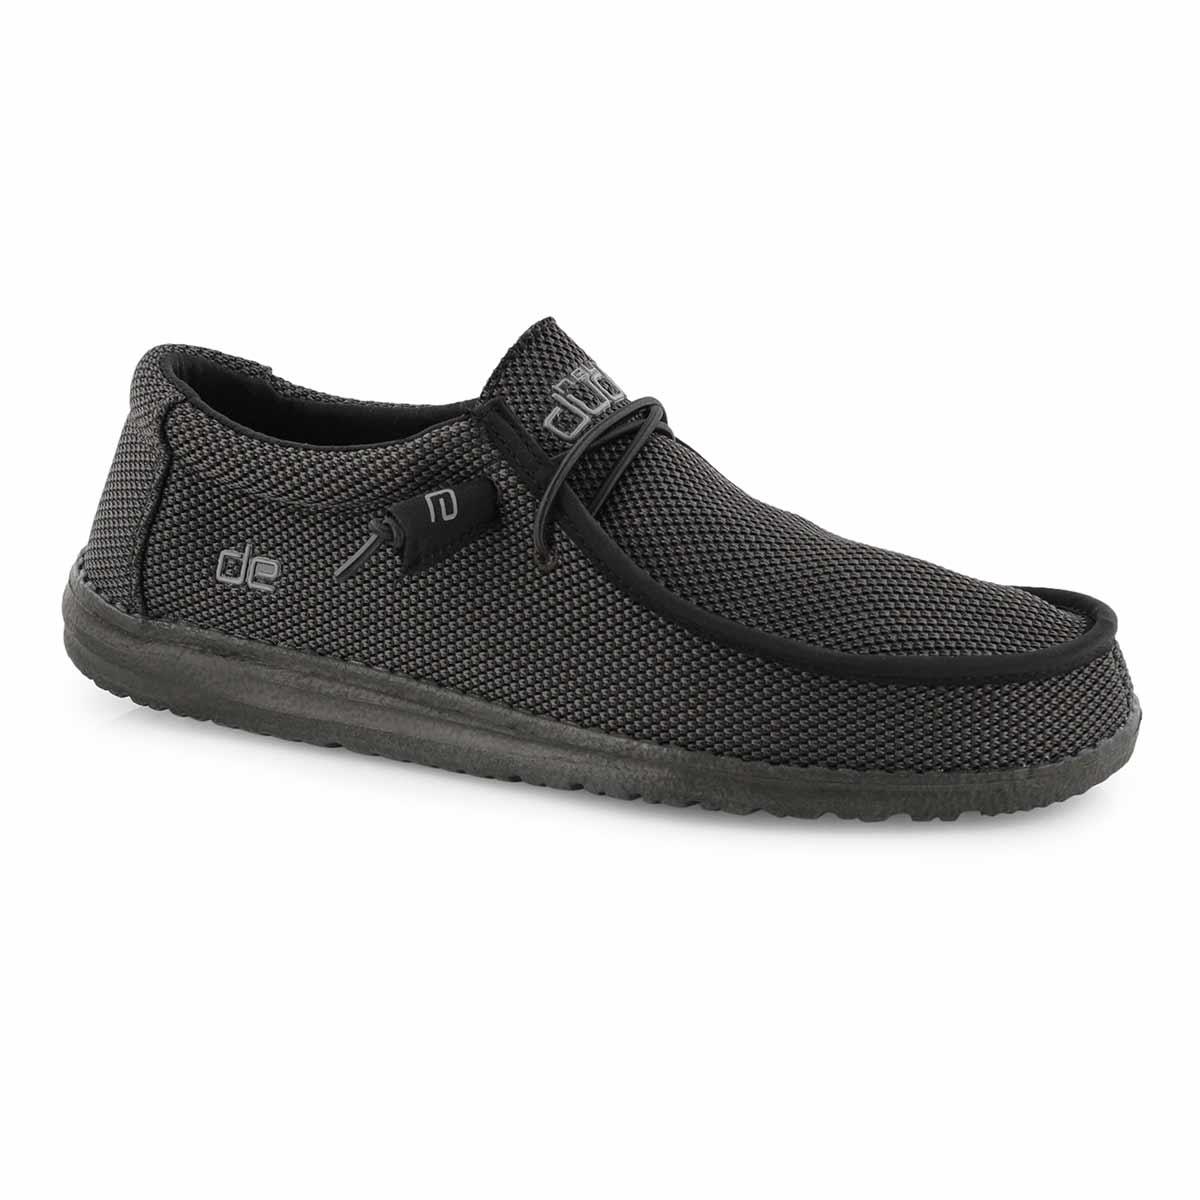 Mns Wally L Sox black casual shoe